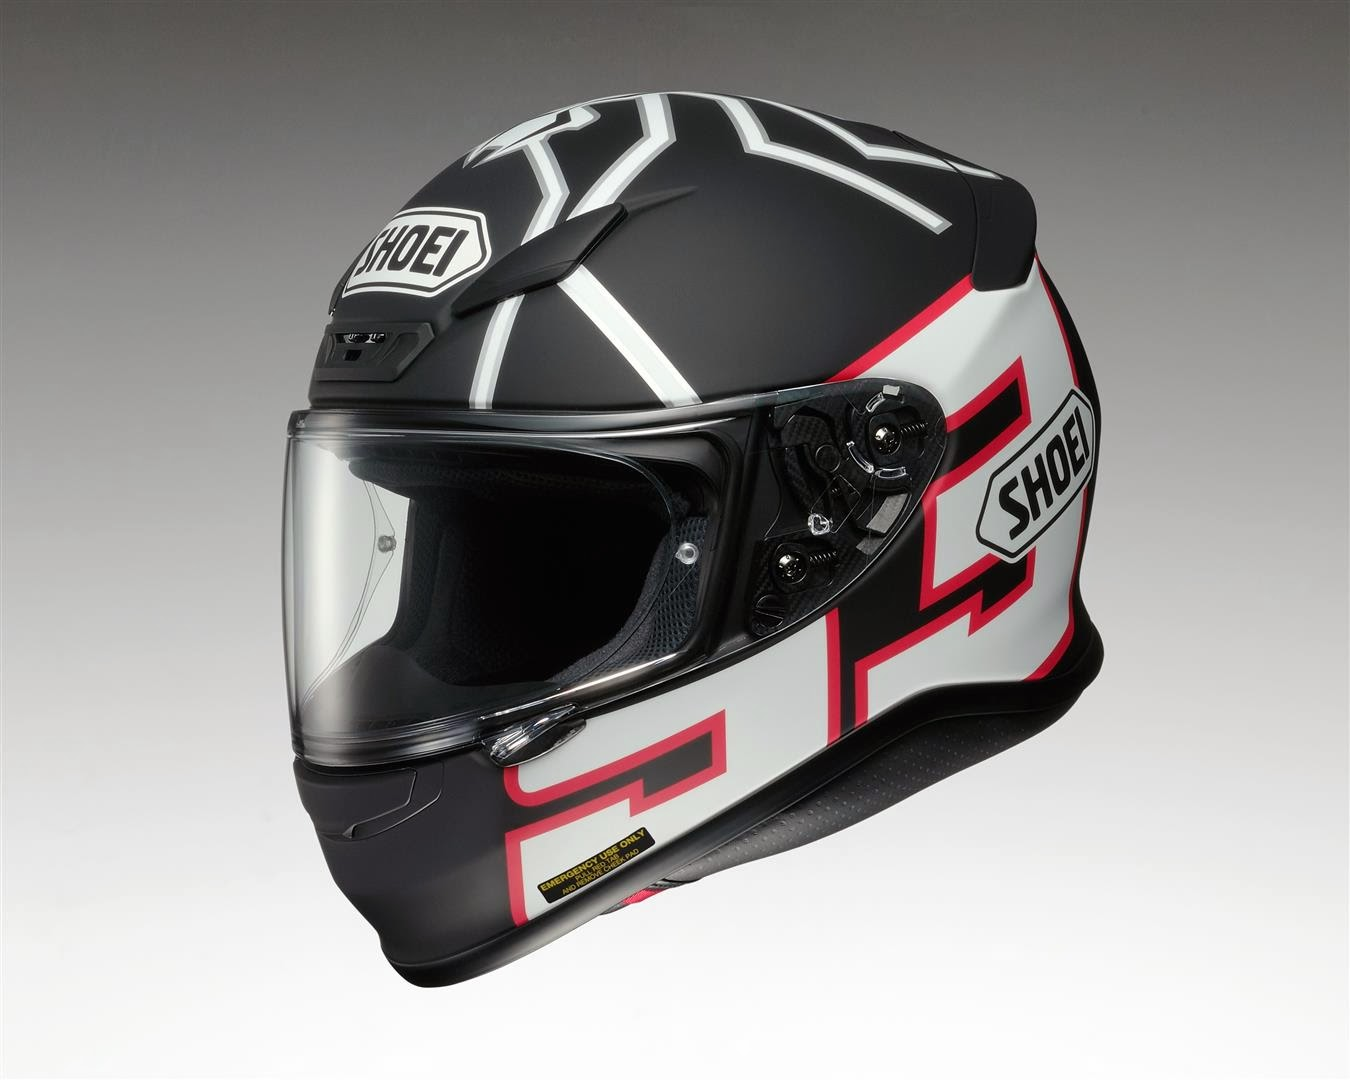 racing helmets garage shoei nxr replica marquez test. Black Bedroom Furniture Sets. Home Design Ideas